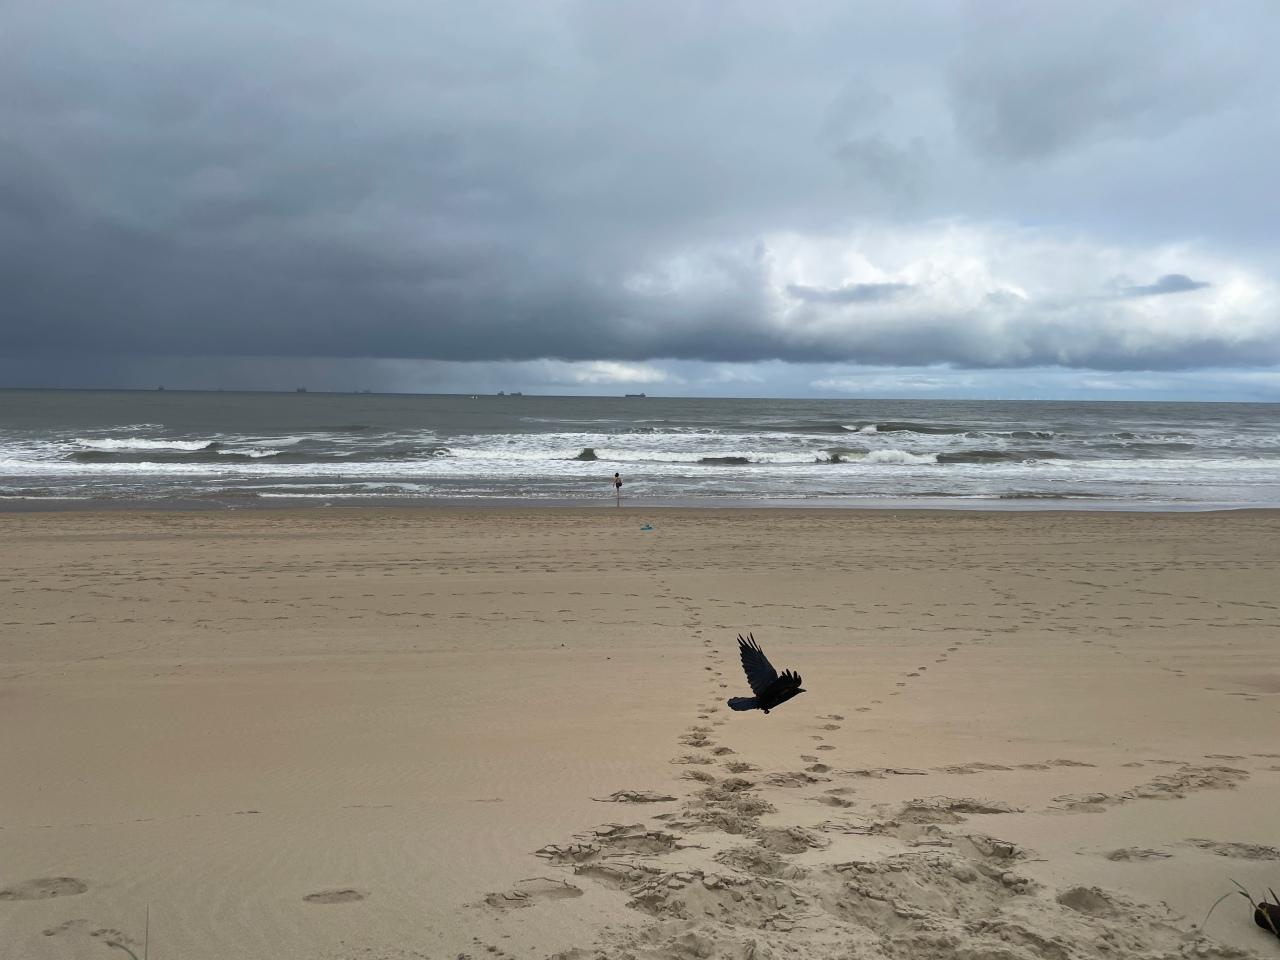 North Sea, Netherland coastline